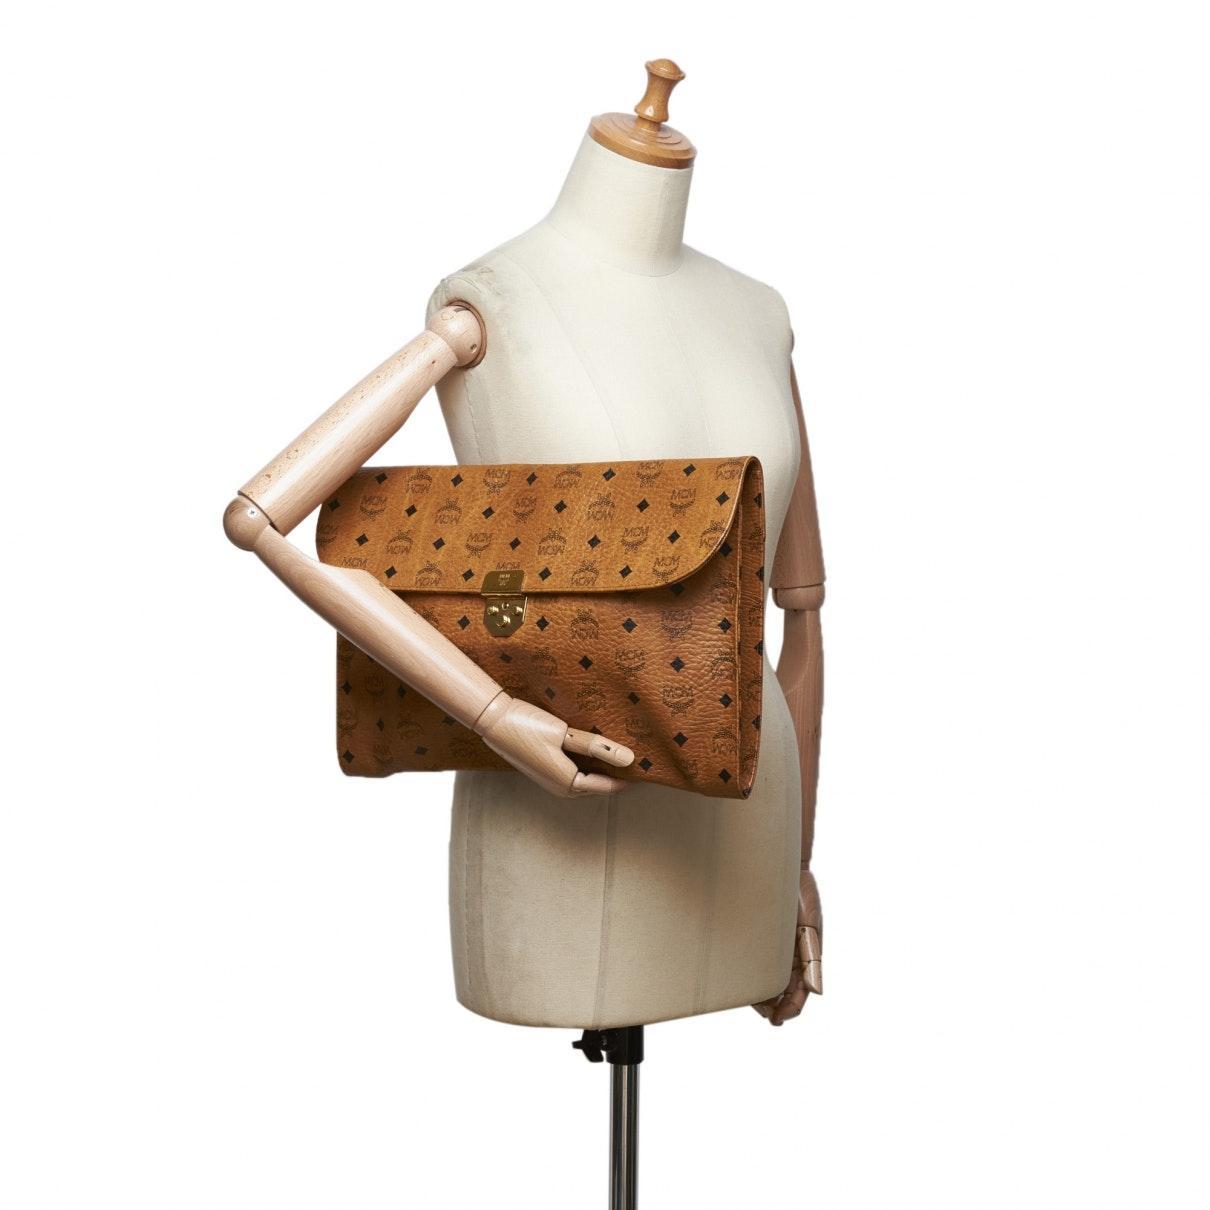 MCM Leder Leder Handtaschen in Braun Ne2fK